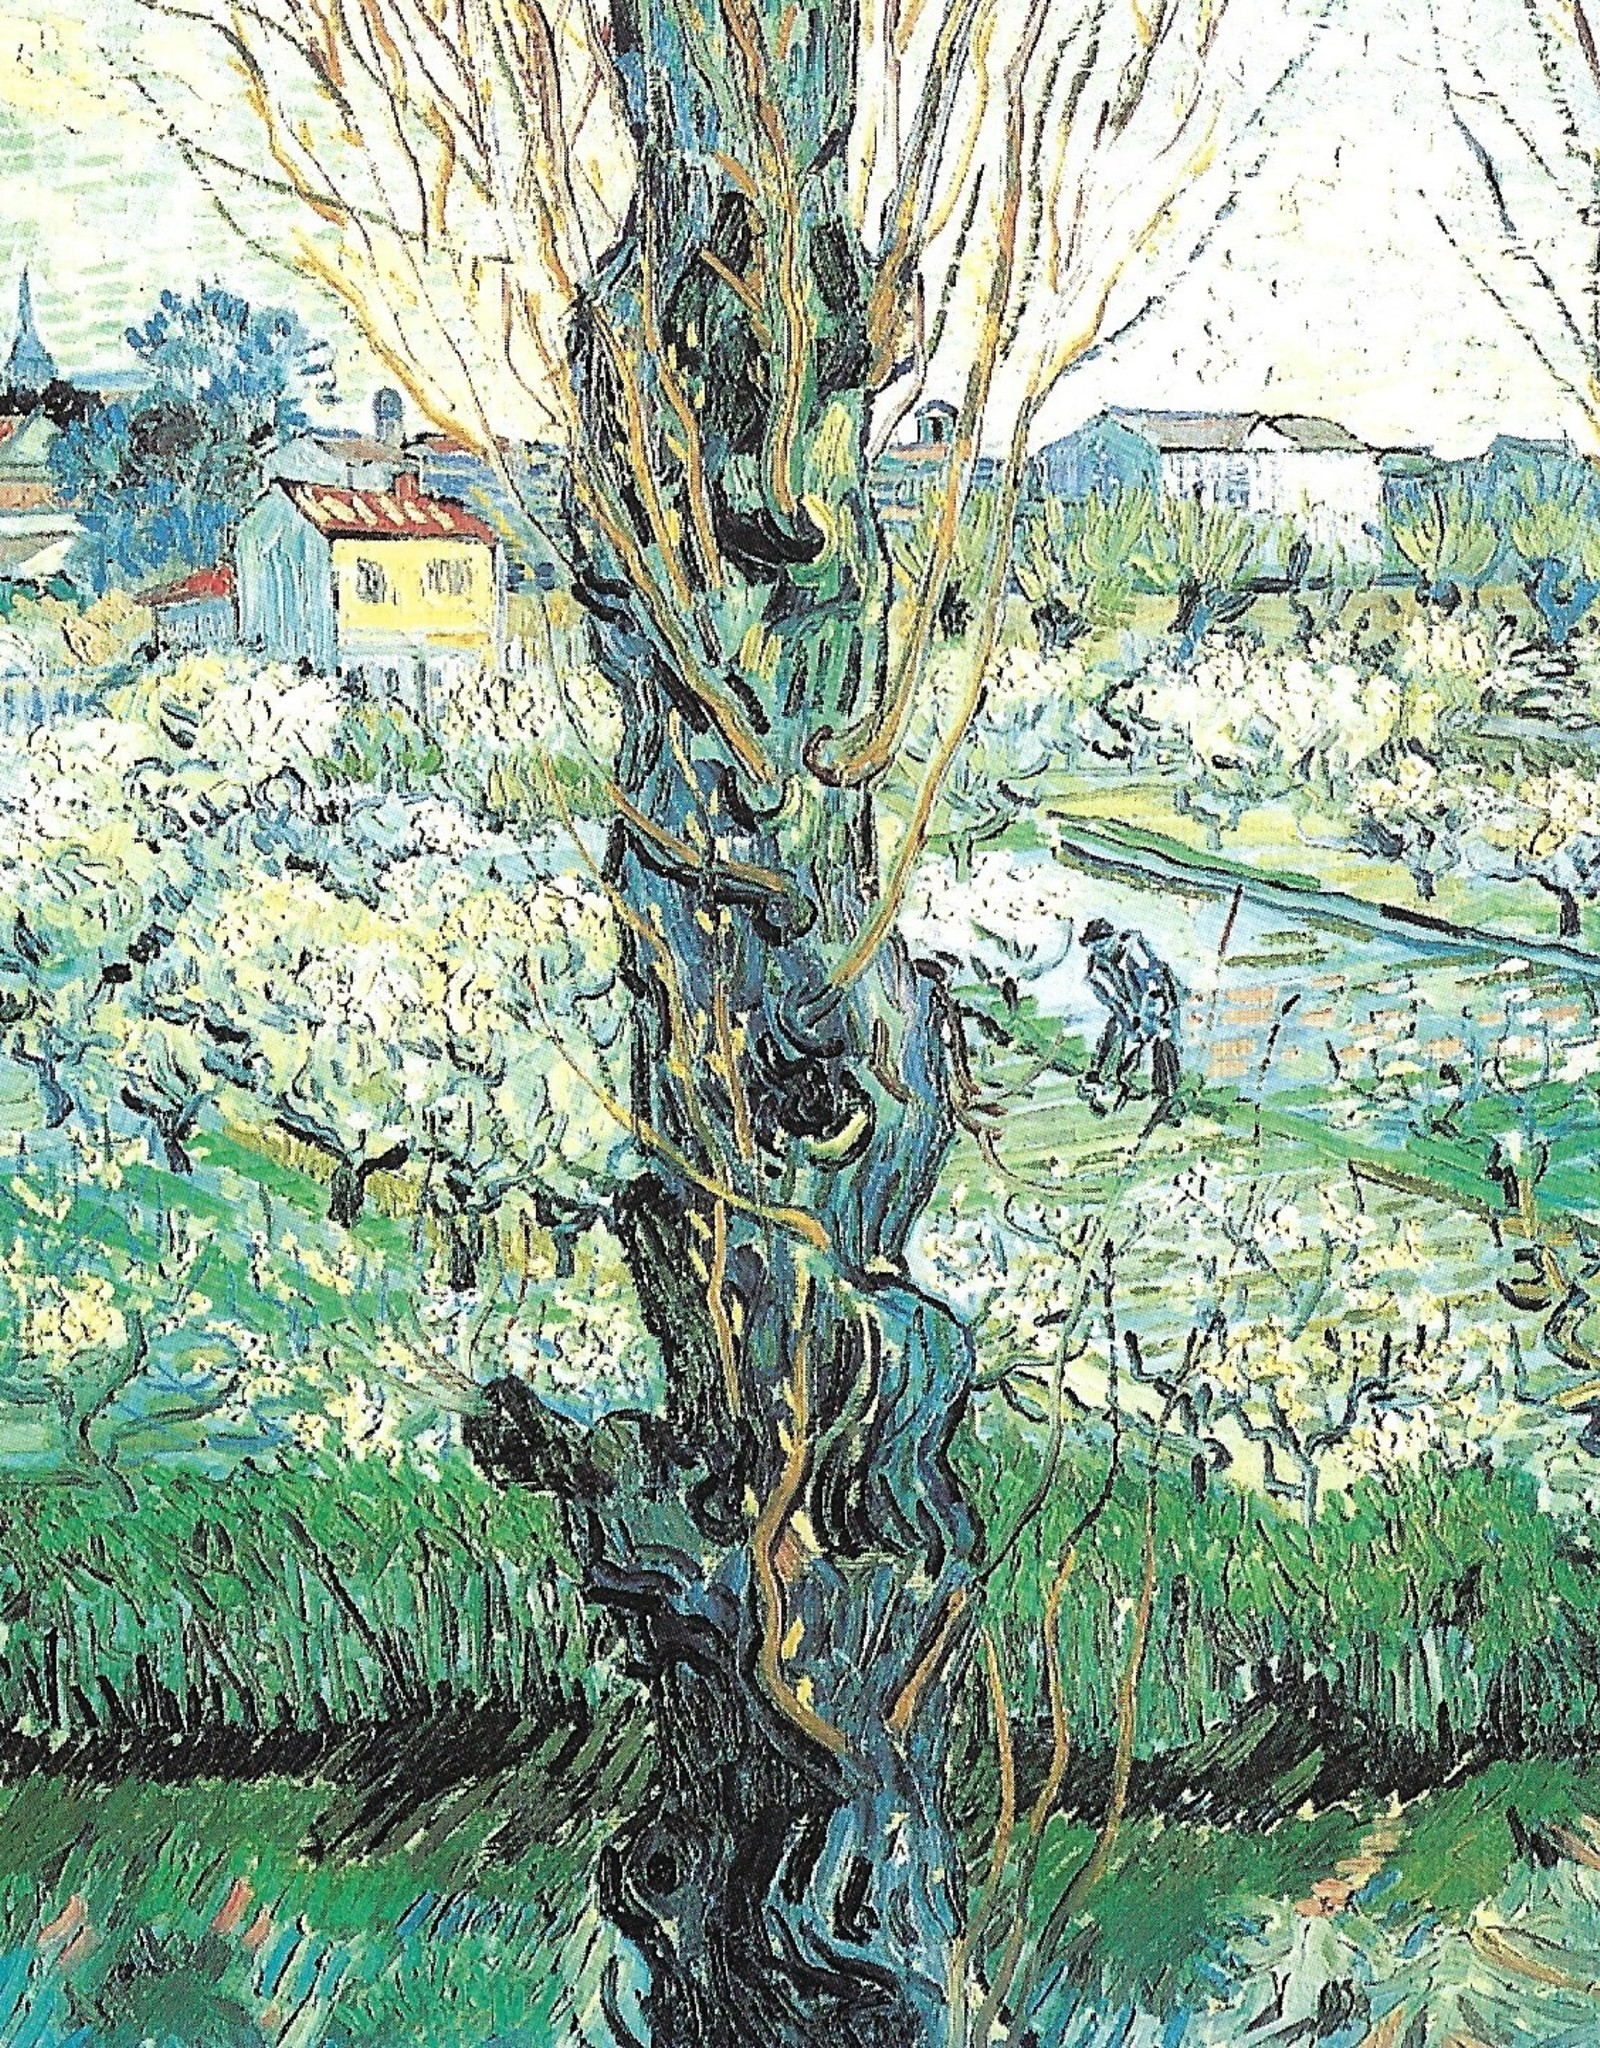 "Galison Art Card, Blank Card 5"" x 6.75"", Van Gogh, Orchard in Bloom with Poplars"